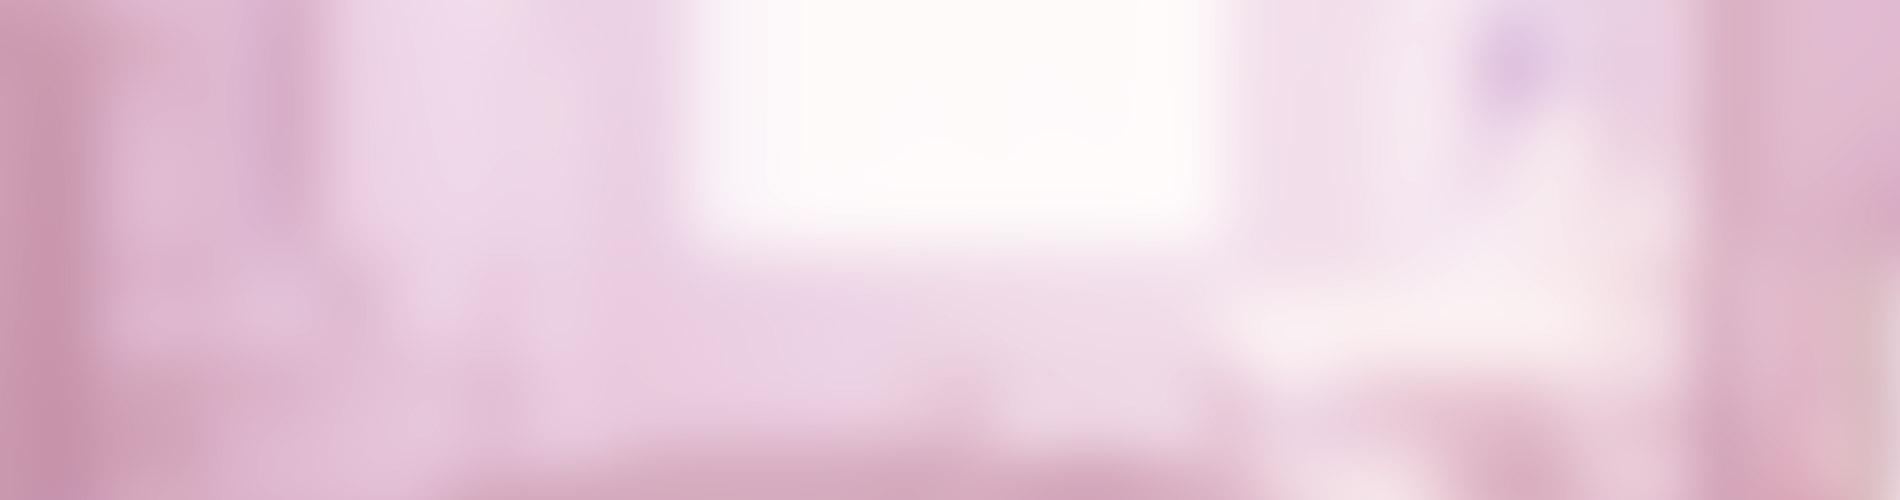 pink-light